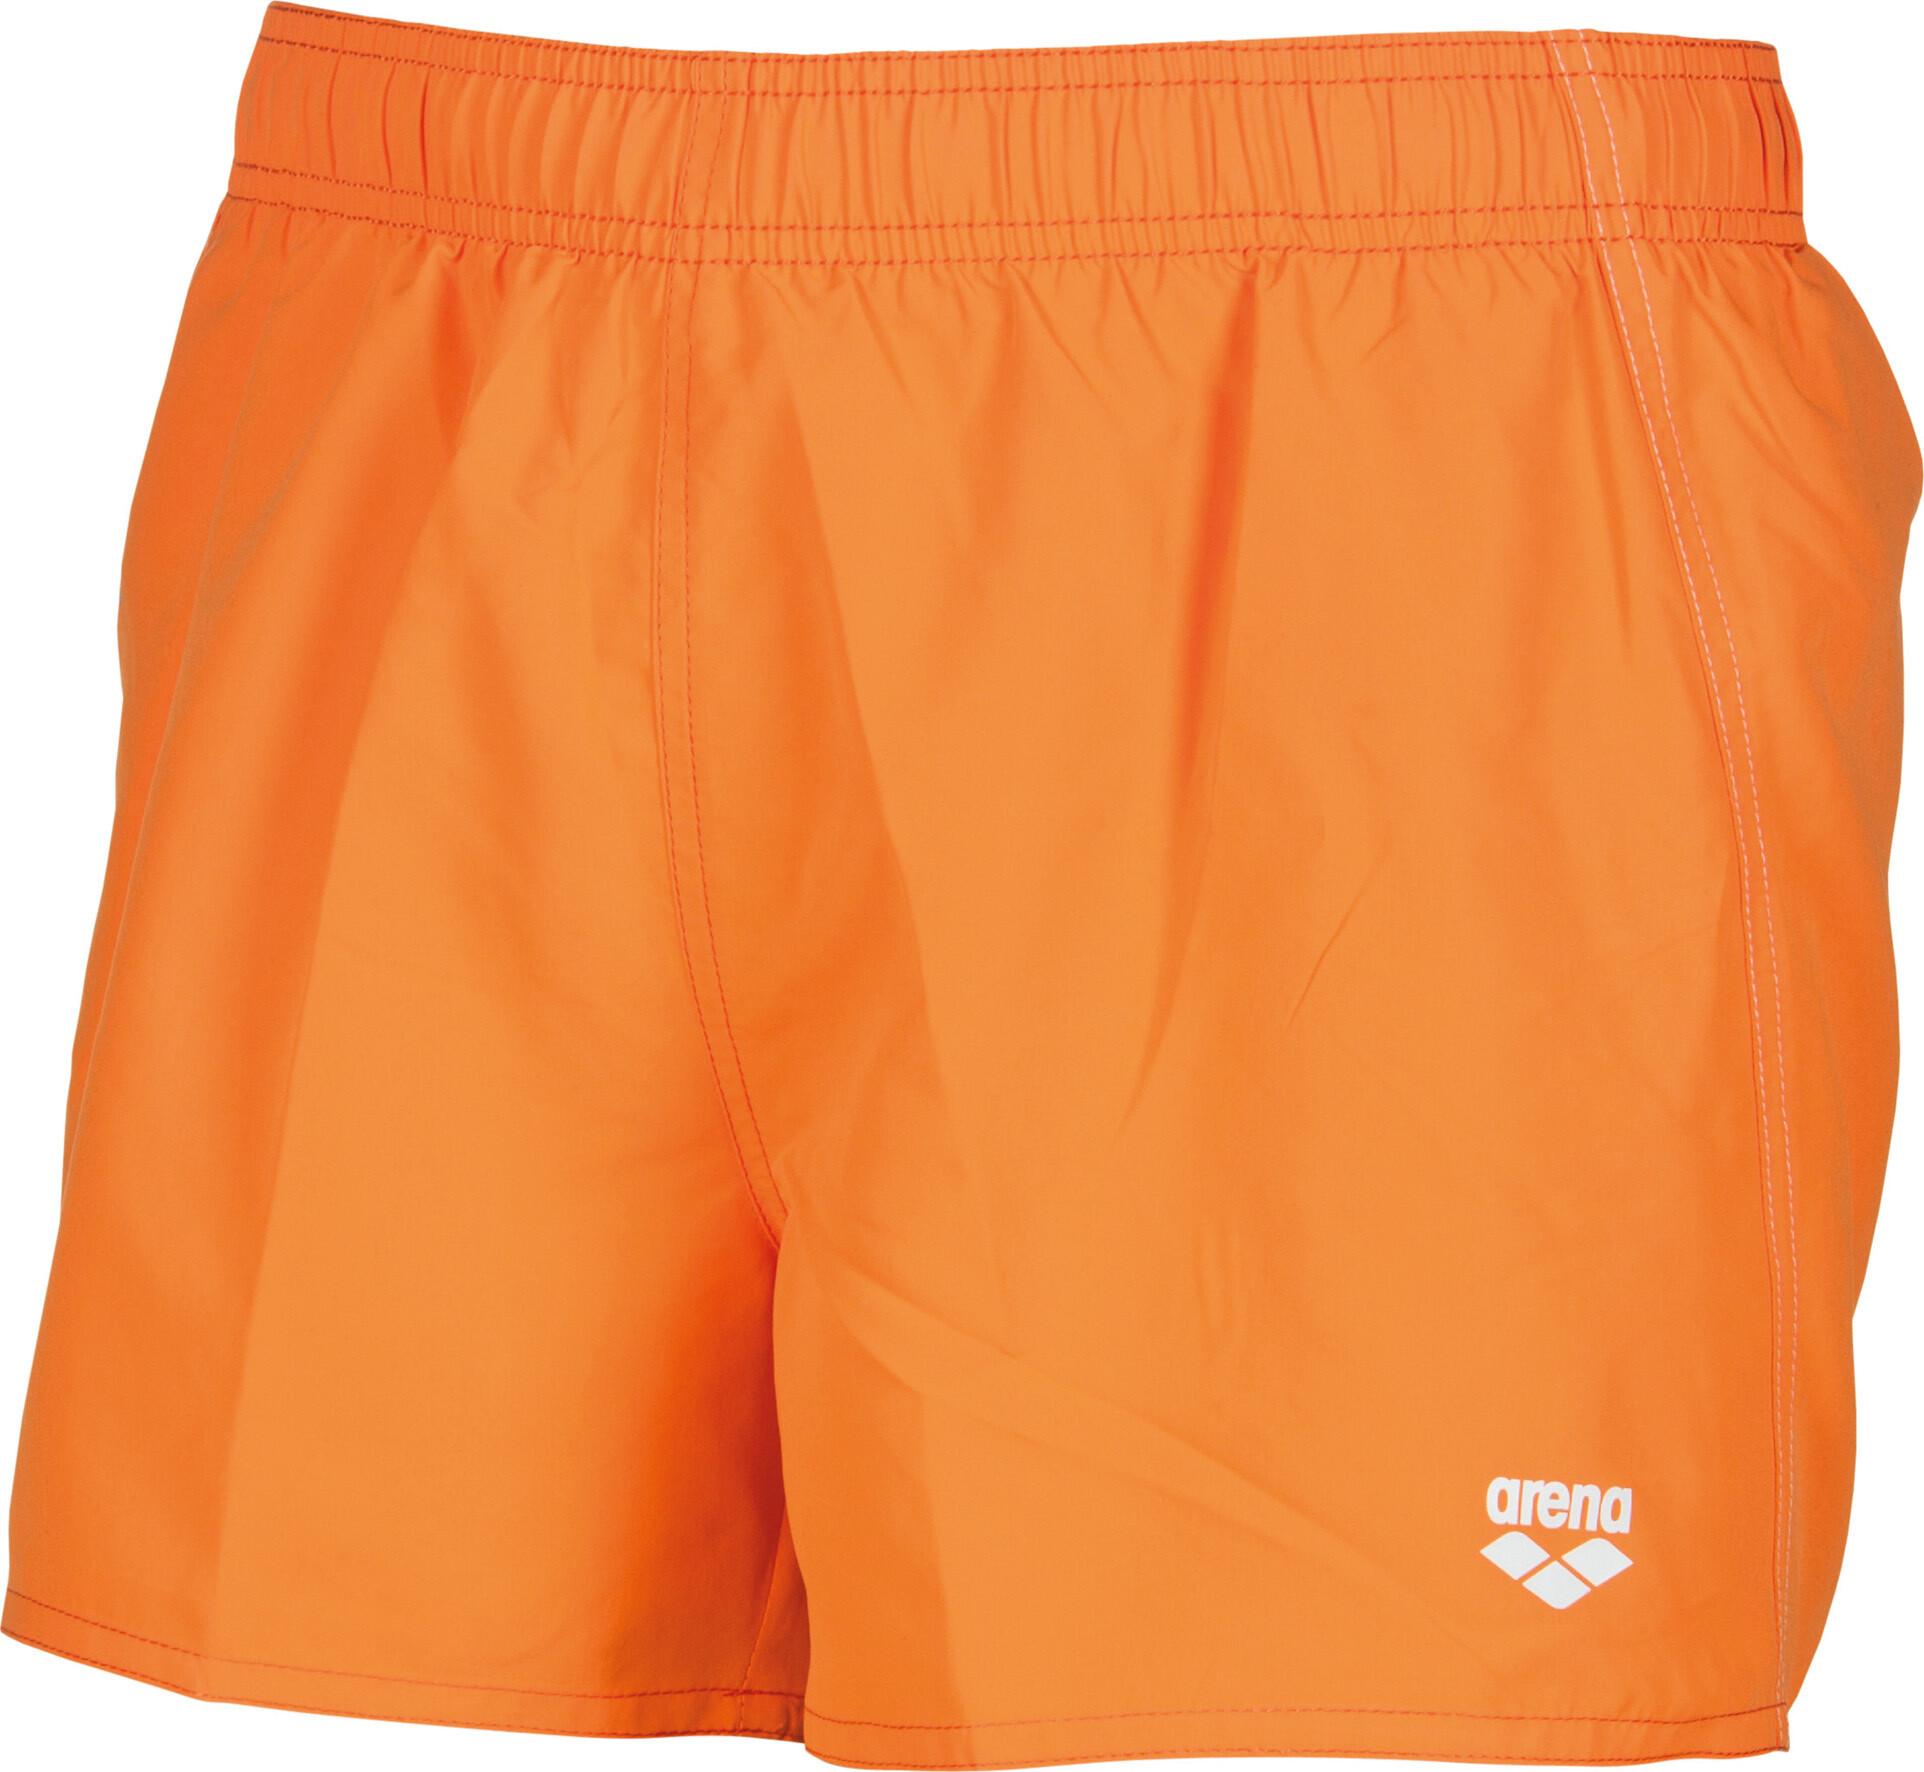 arena Fundamentals Badebukser Herrer, tangerine-white (2019) | swim_clothes